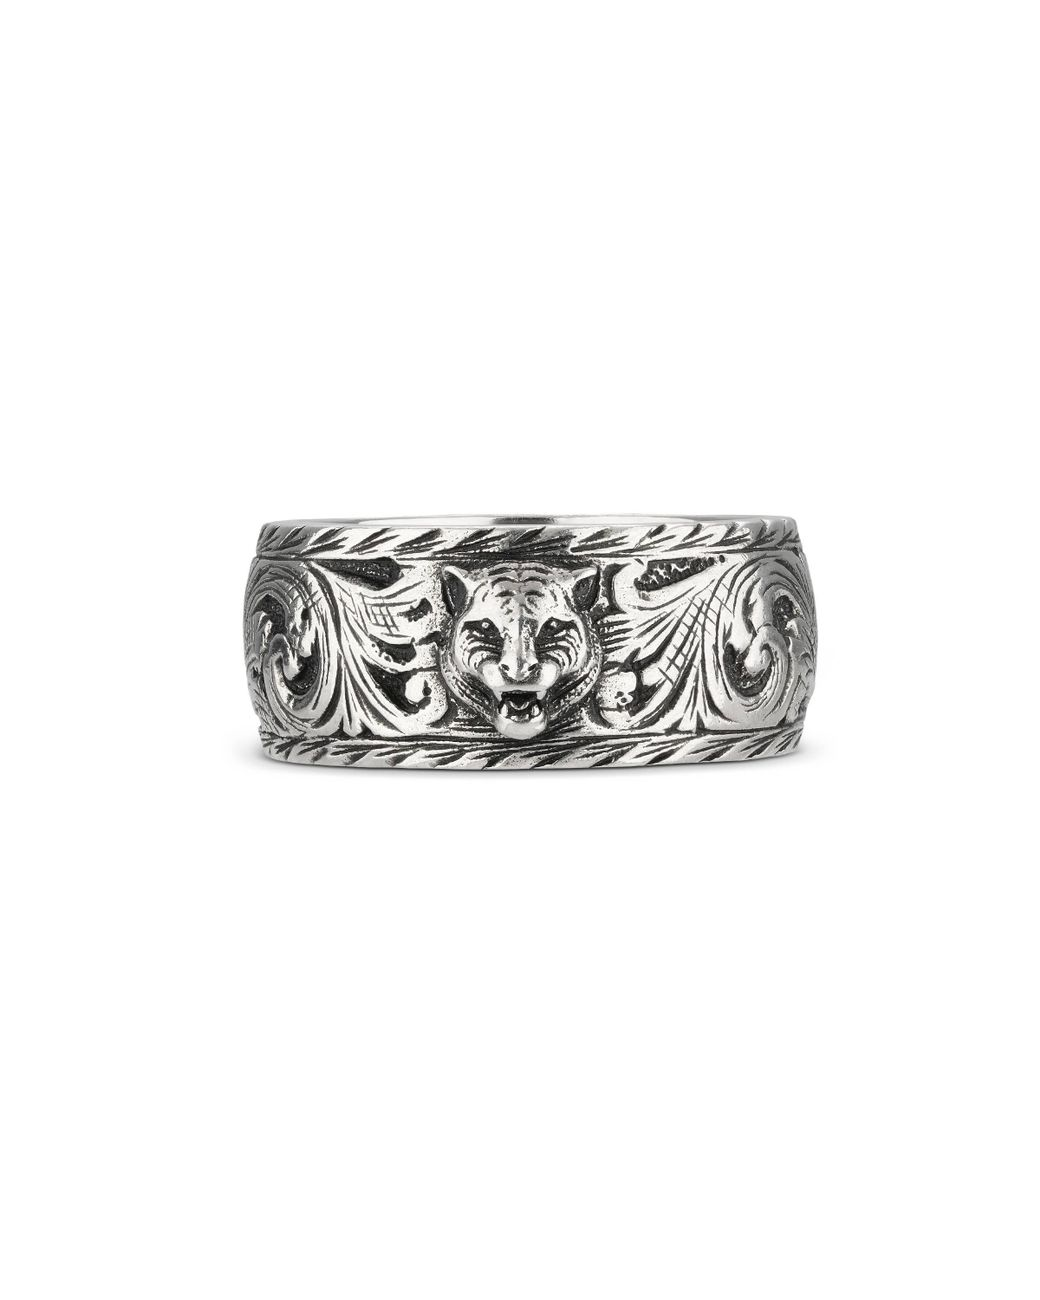 56c3f4f879 Men's Metallic Thin Silver Ring With Feline Head